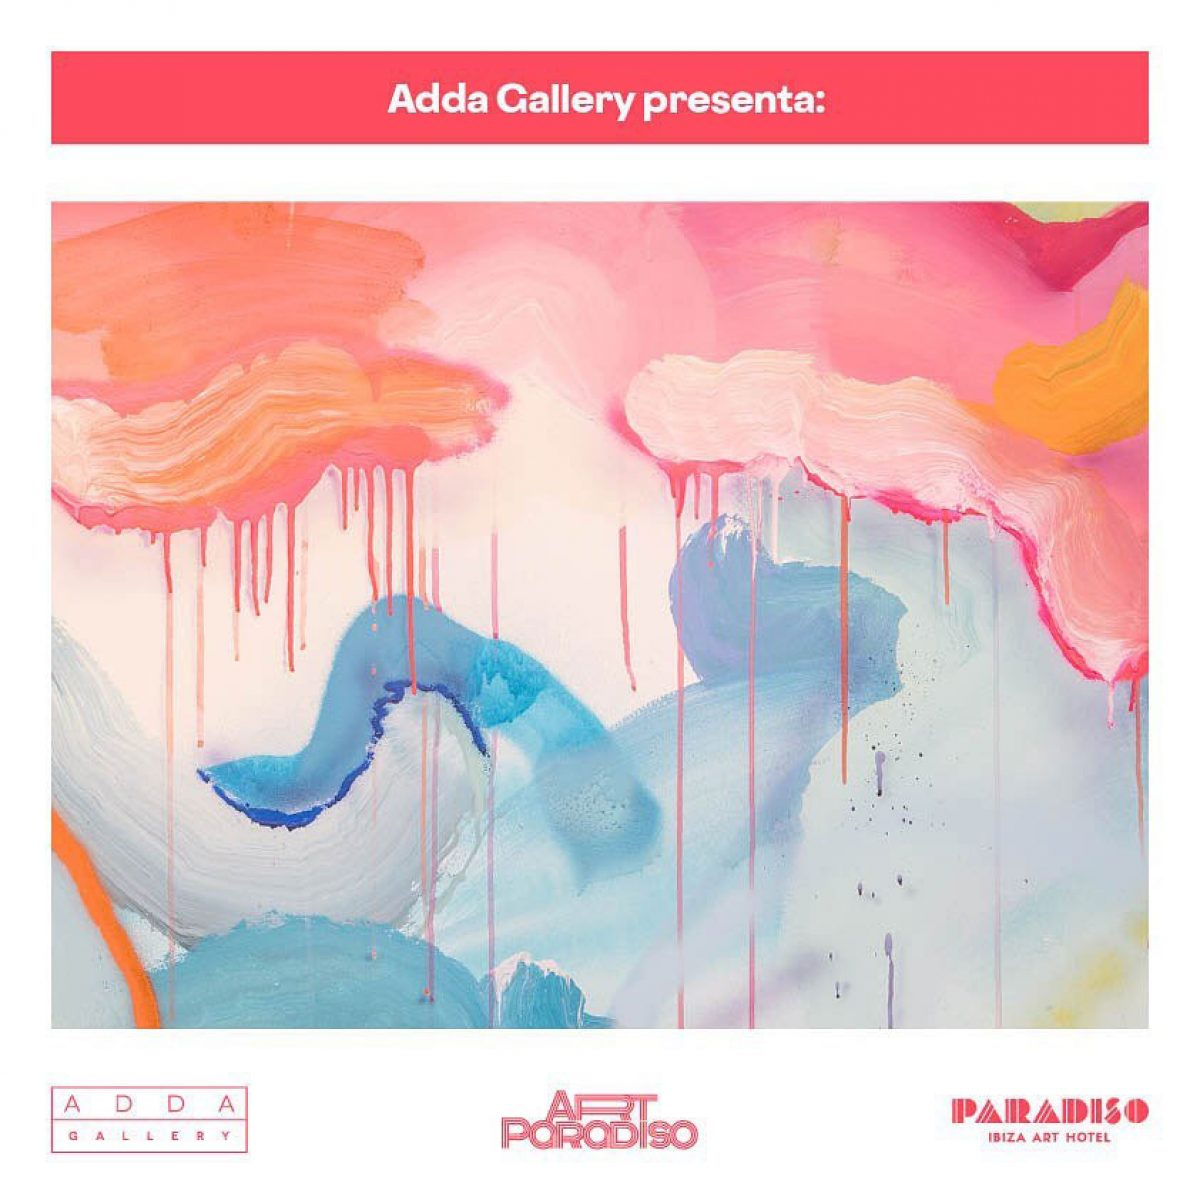 mister-piro-adda-art-gallery-paradiso-ibiza-2020-welcometoibiza